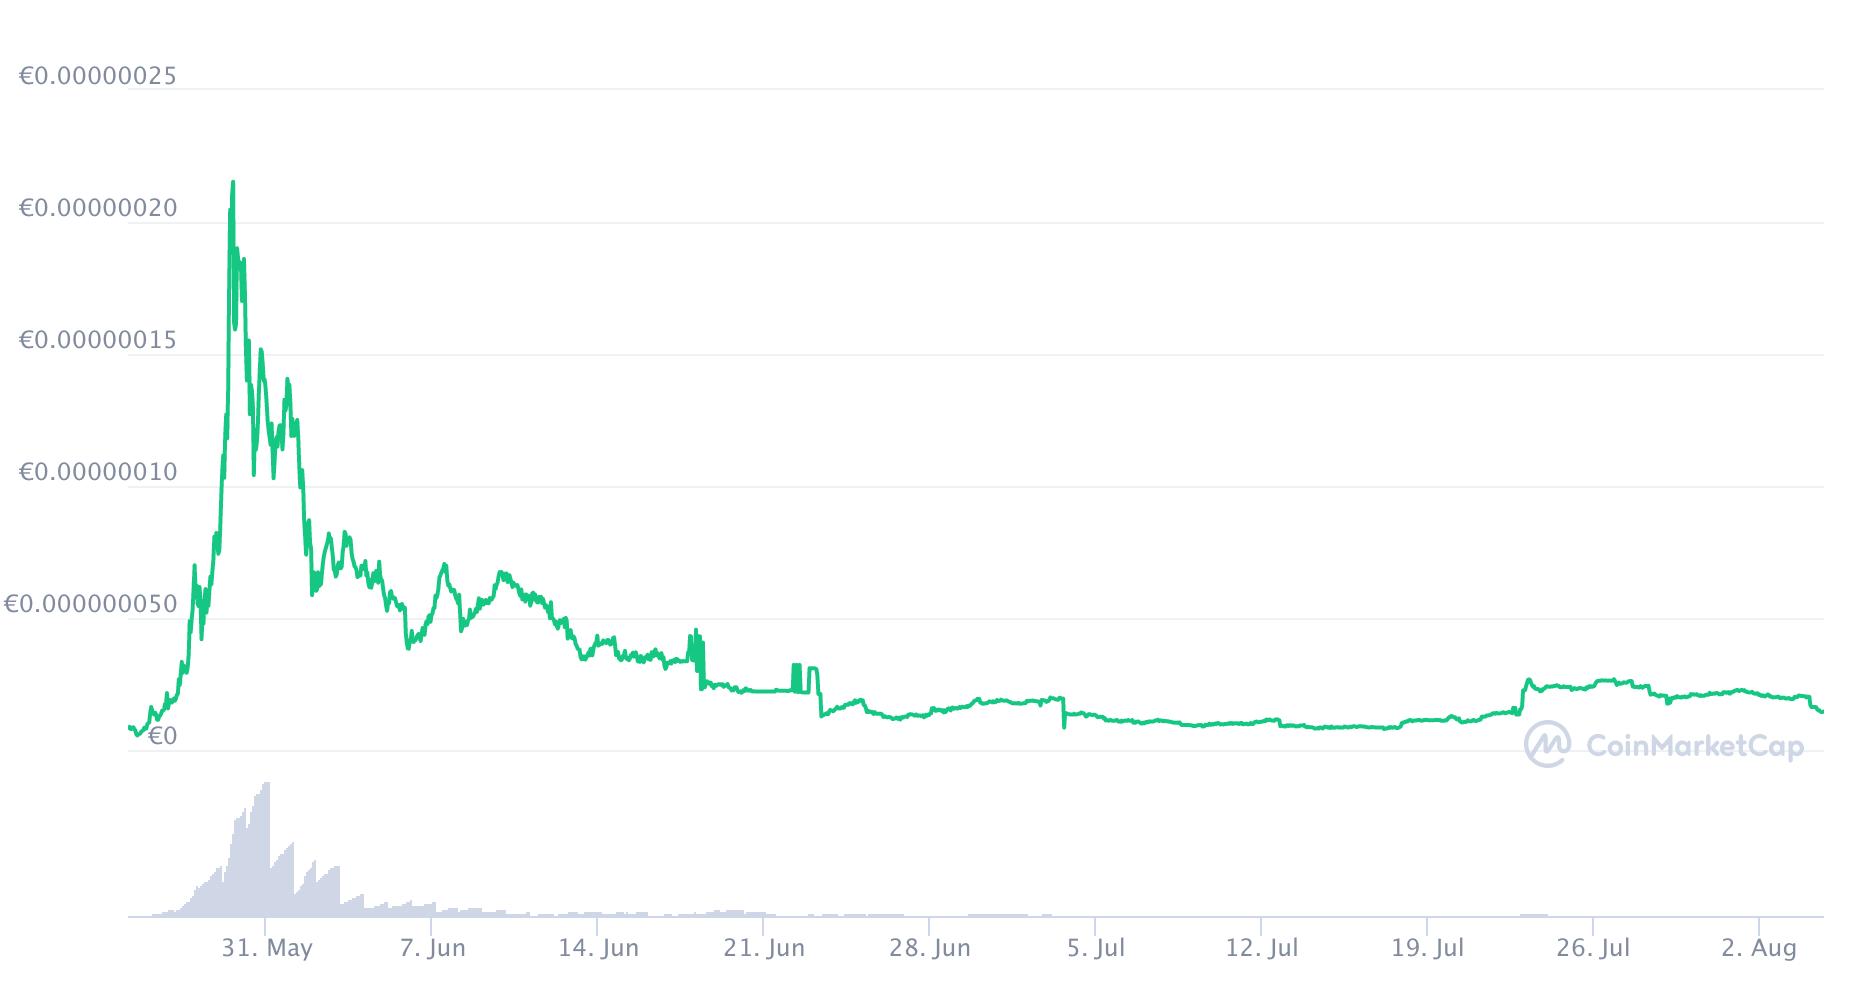 hodl crypto kopen prijsgrafiek coinmarketcap